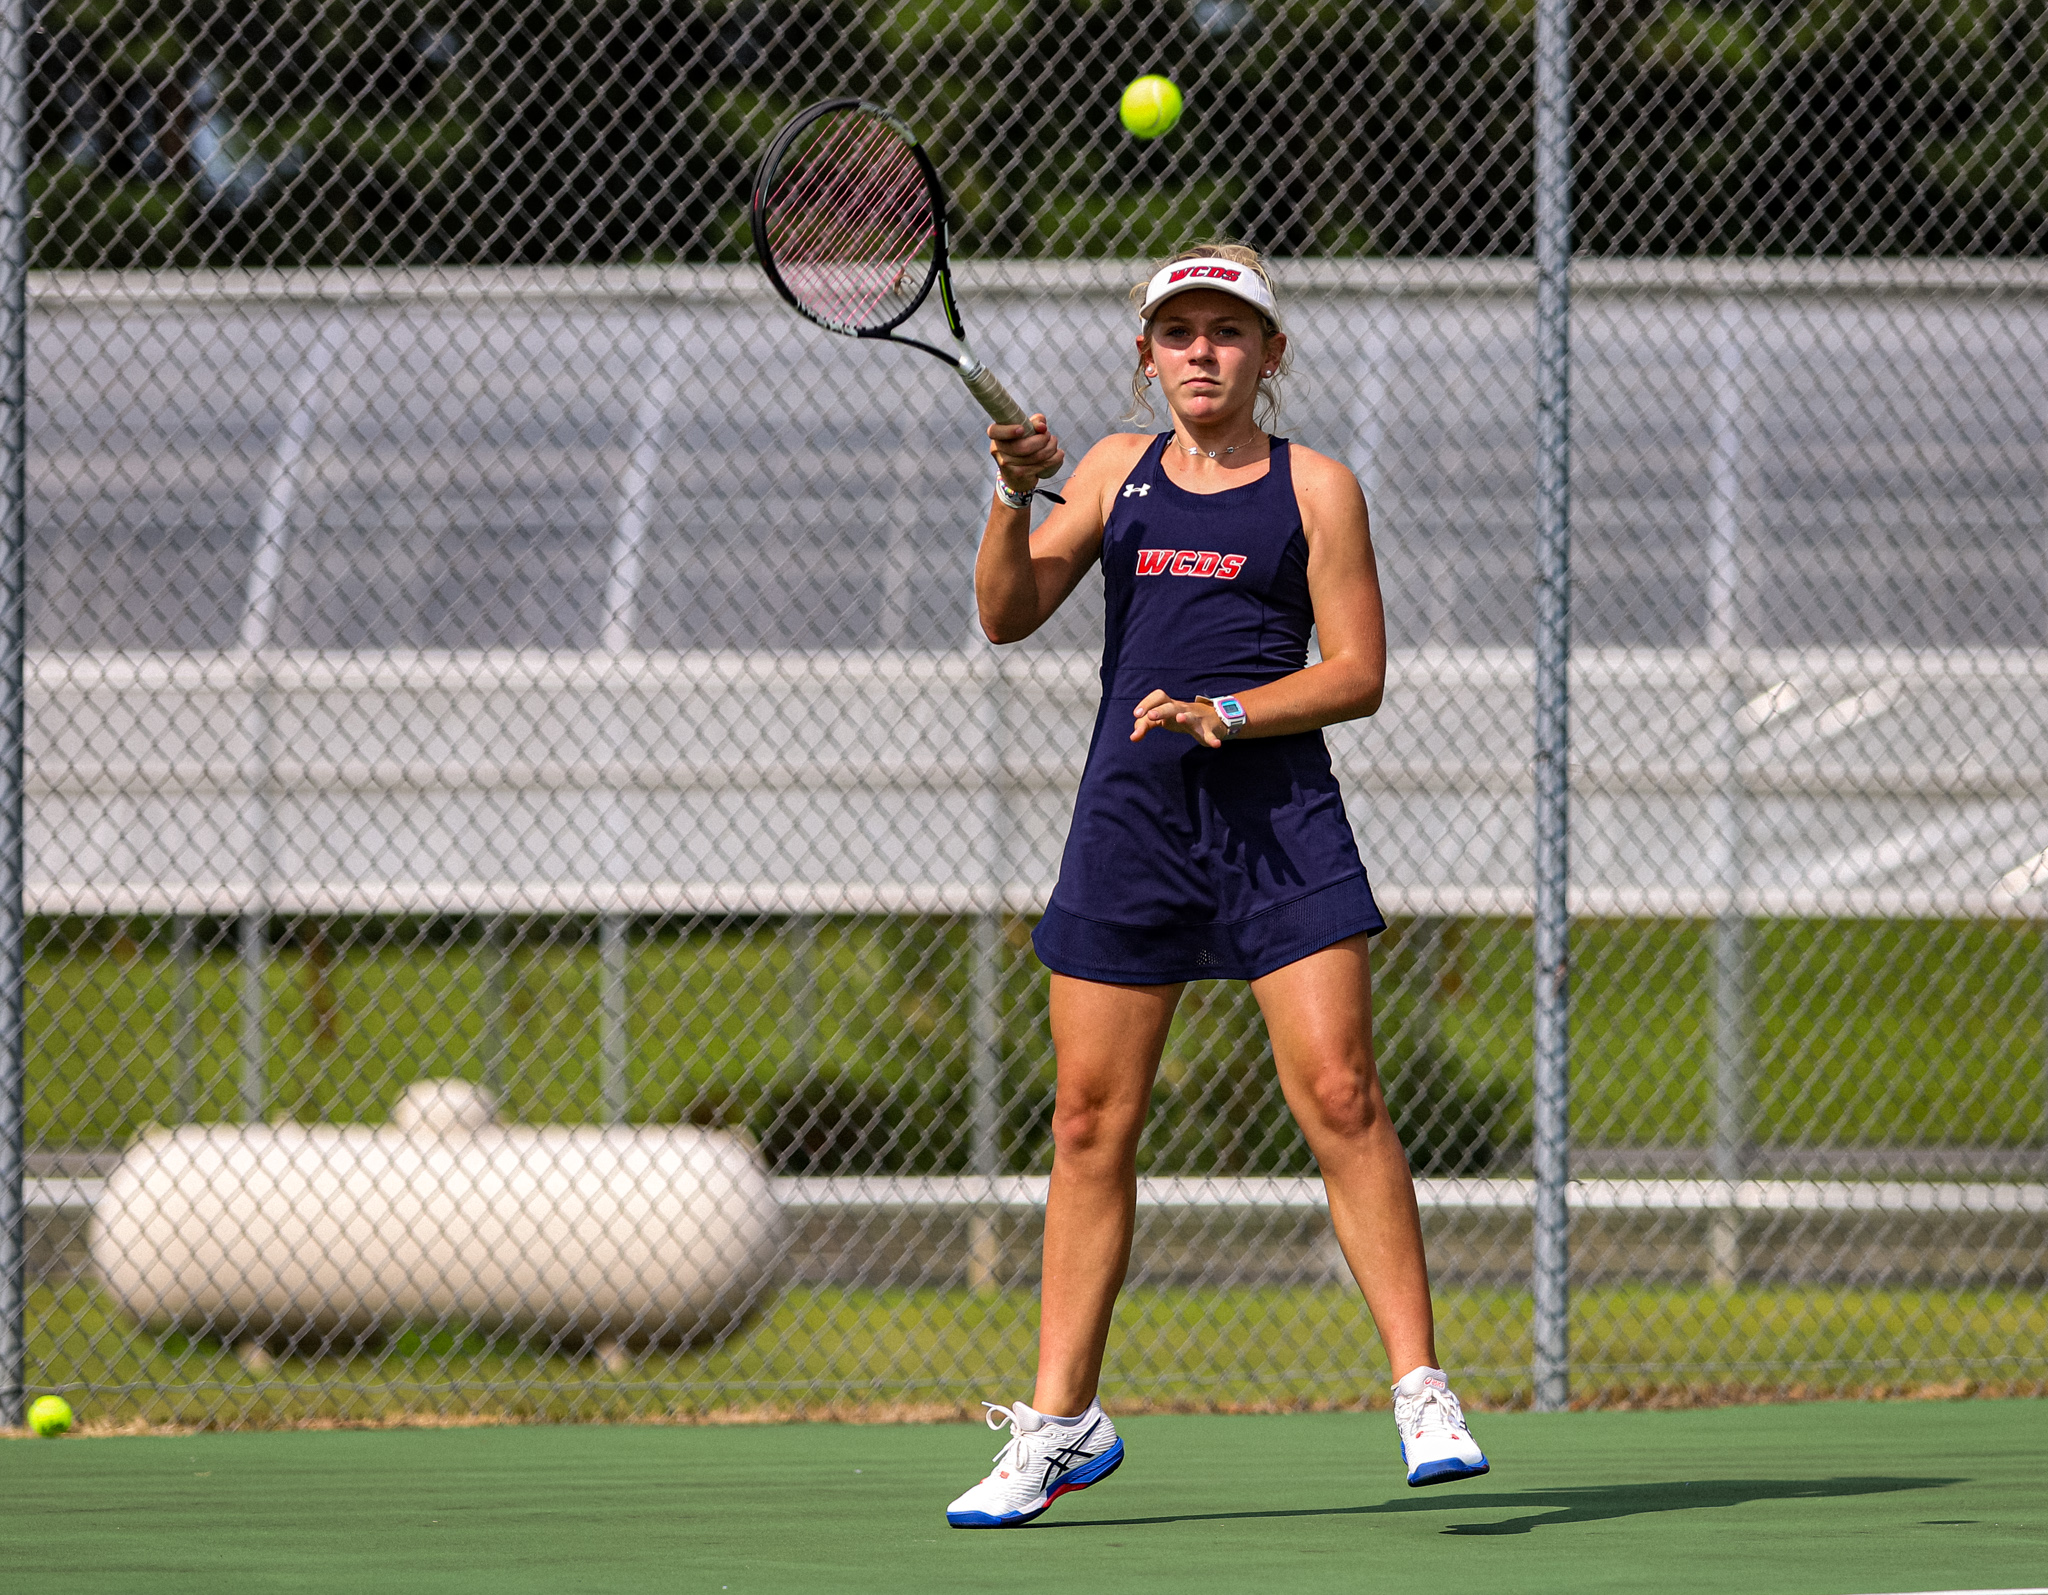 Girls Tennis: WCDS Opens Season Against Cape Fear Christian Academy (PHOTO GALLERY)